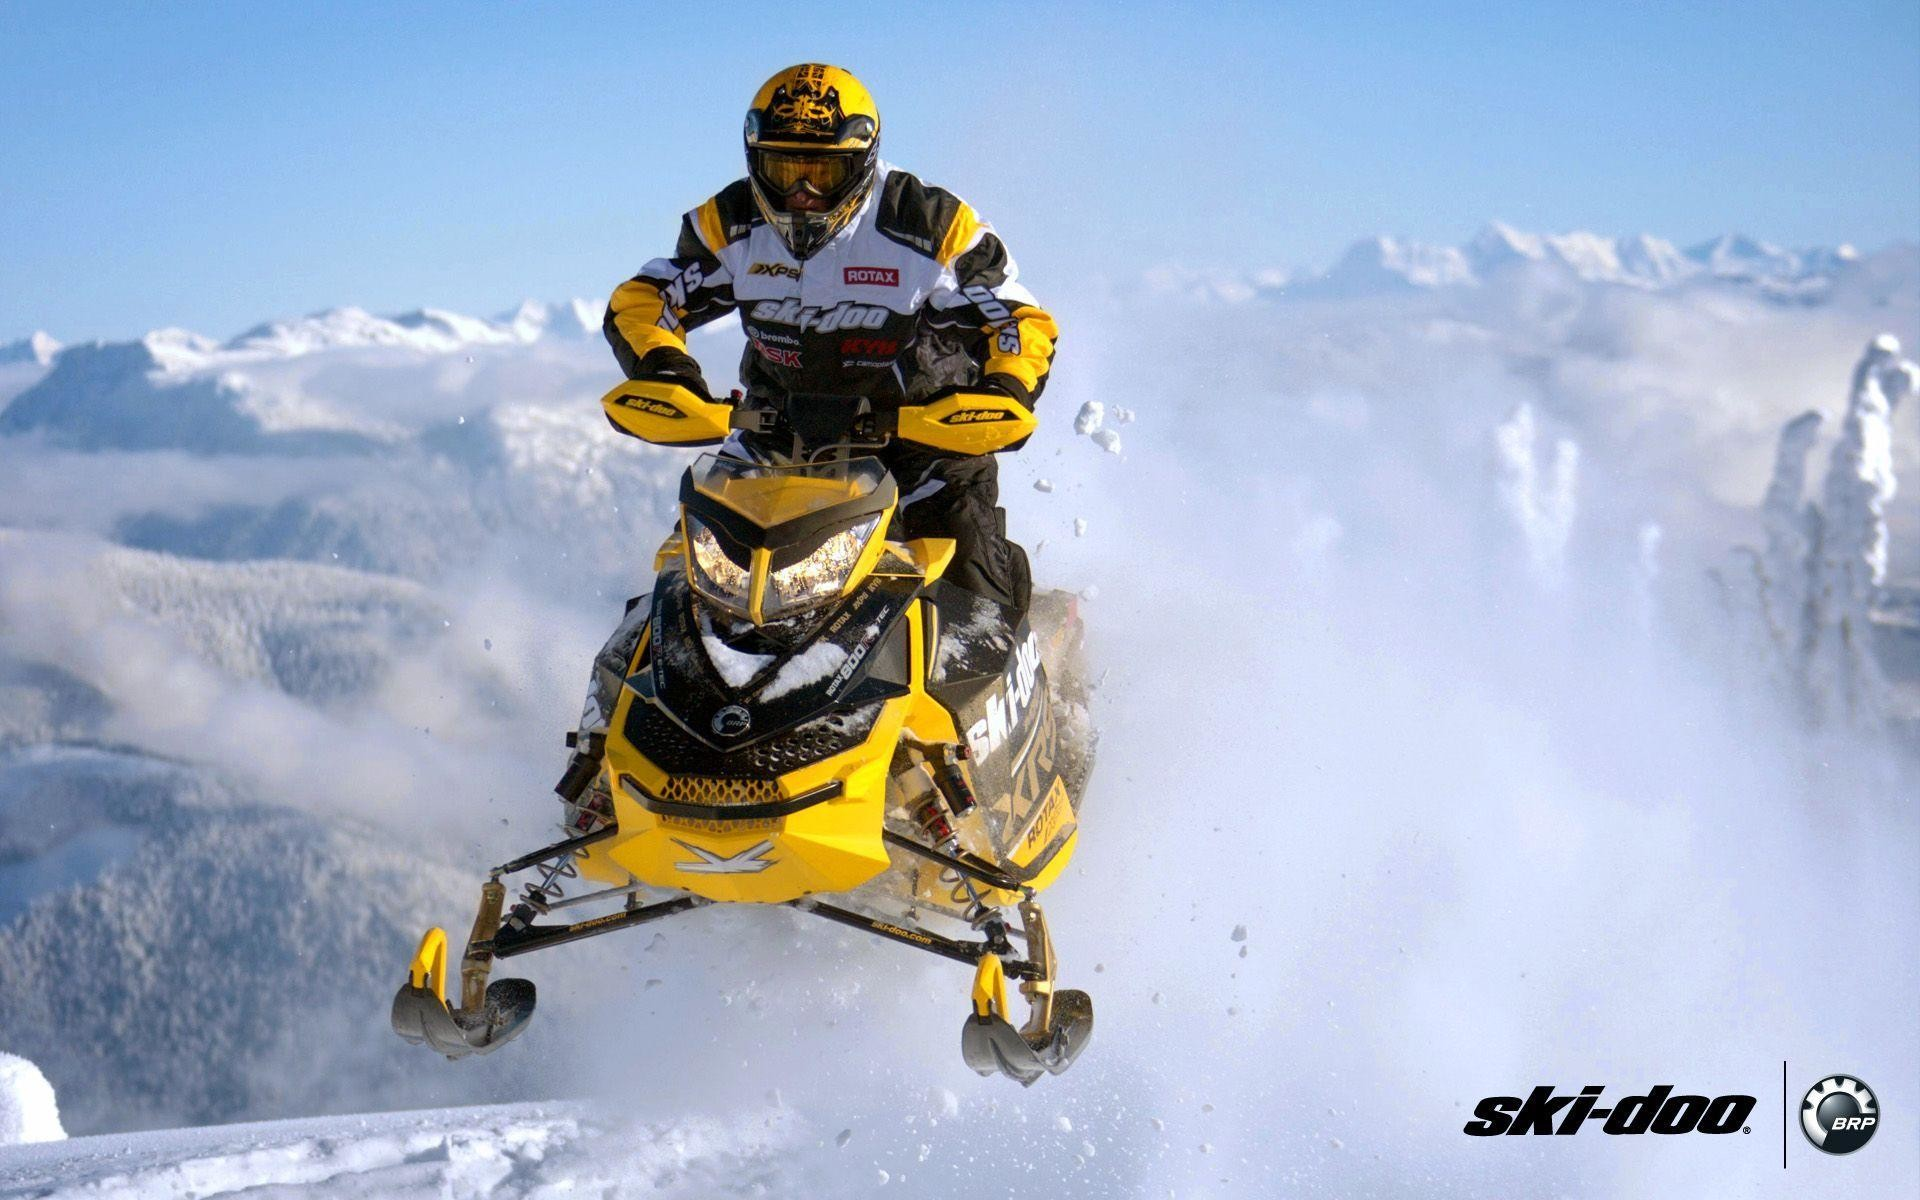 SKI-DOO MXZ Turbo Sno Pro snowmobile winter ski doo r wallpaper .